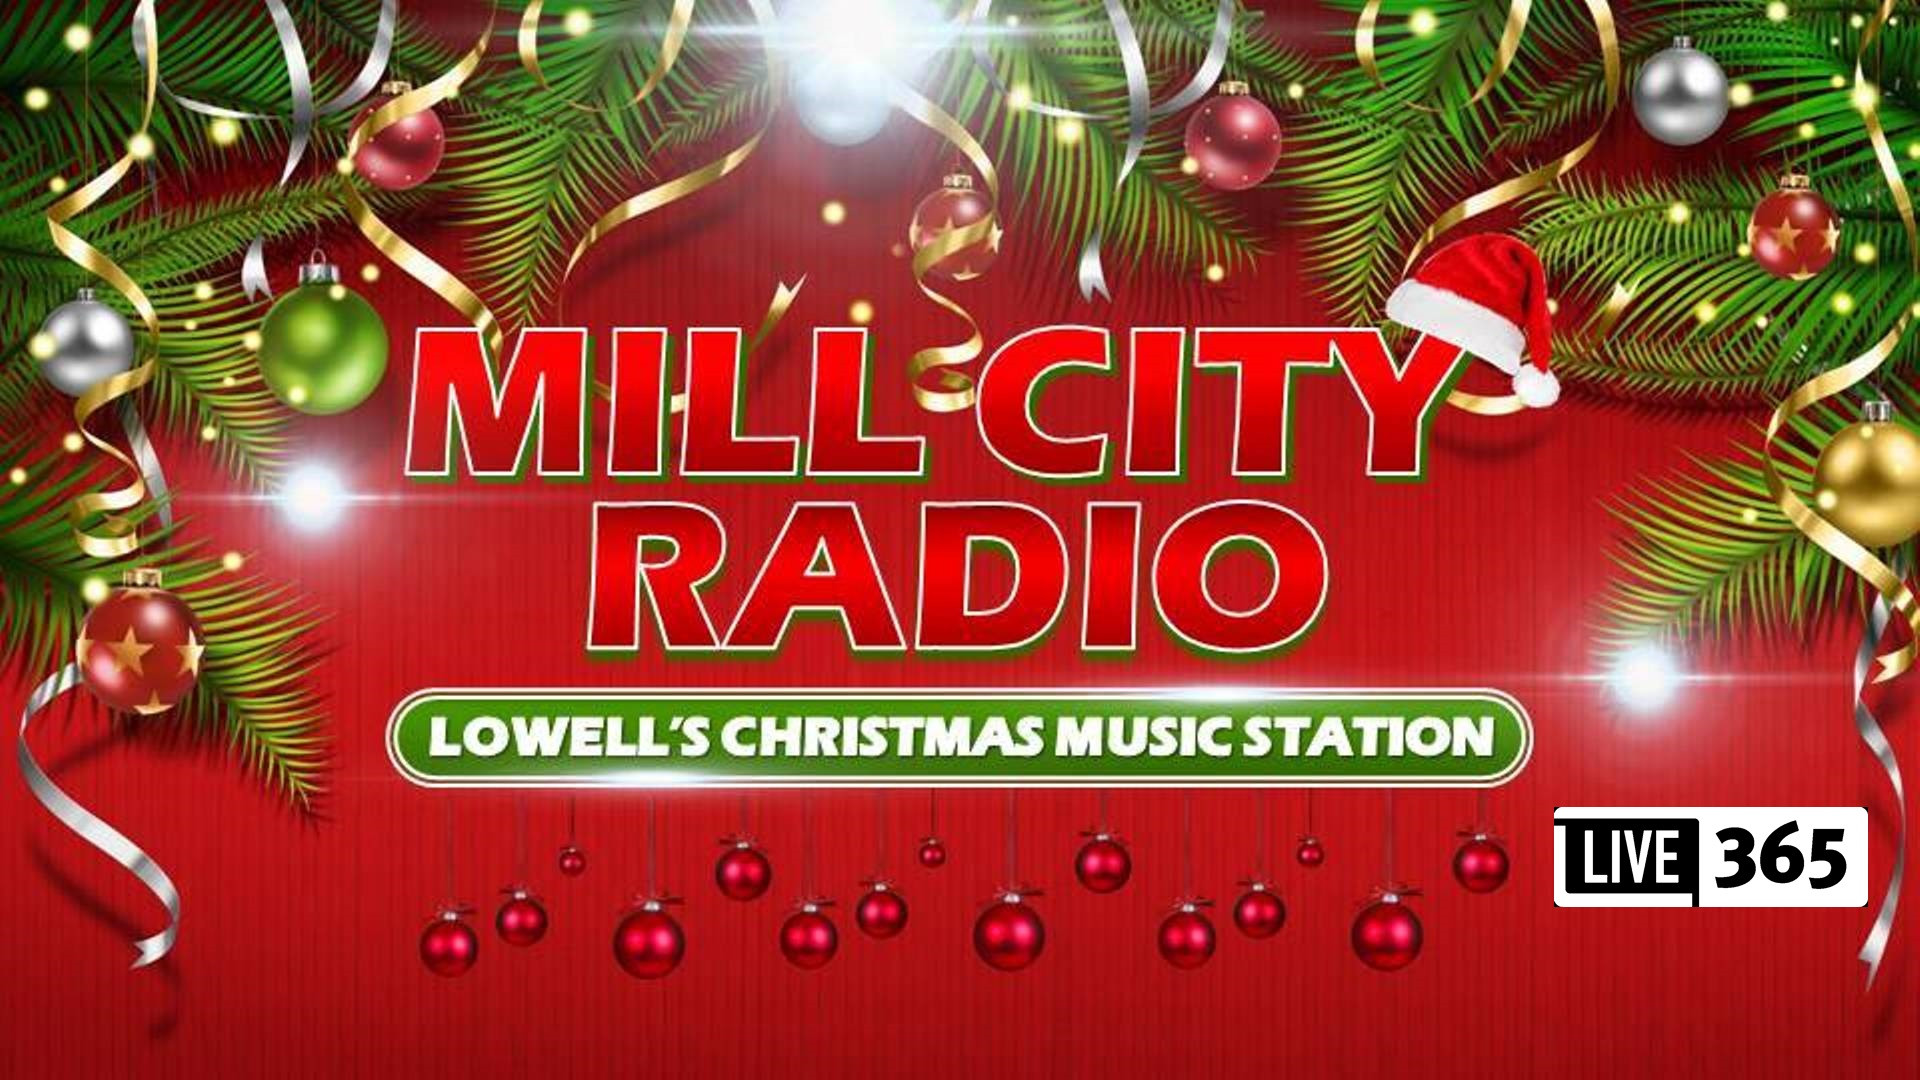 Christmas Music Radio Stations 2019.Home Mill City Radio